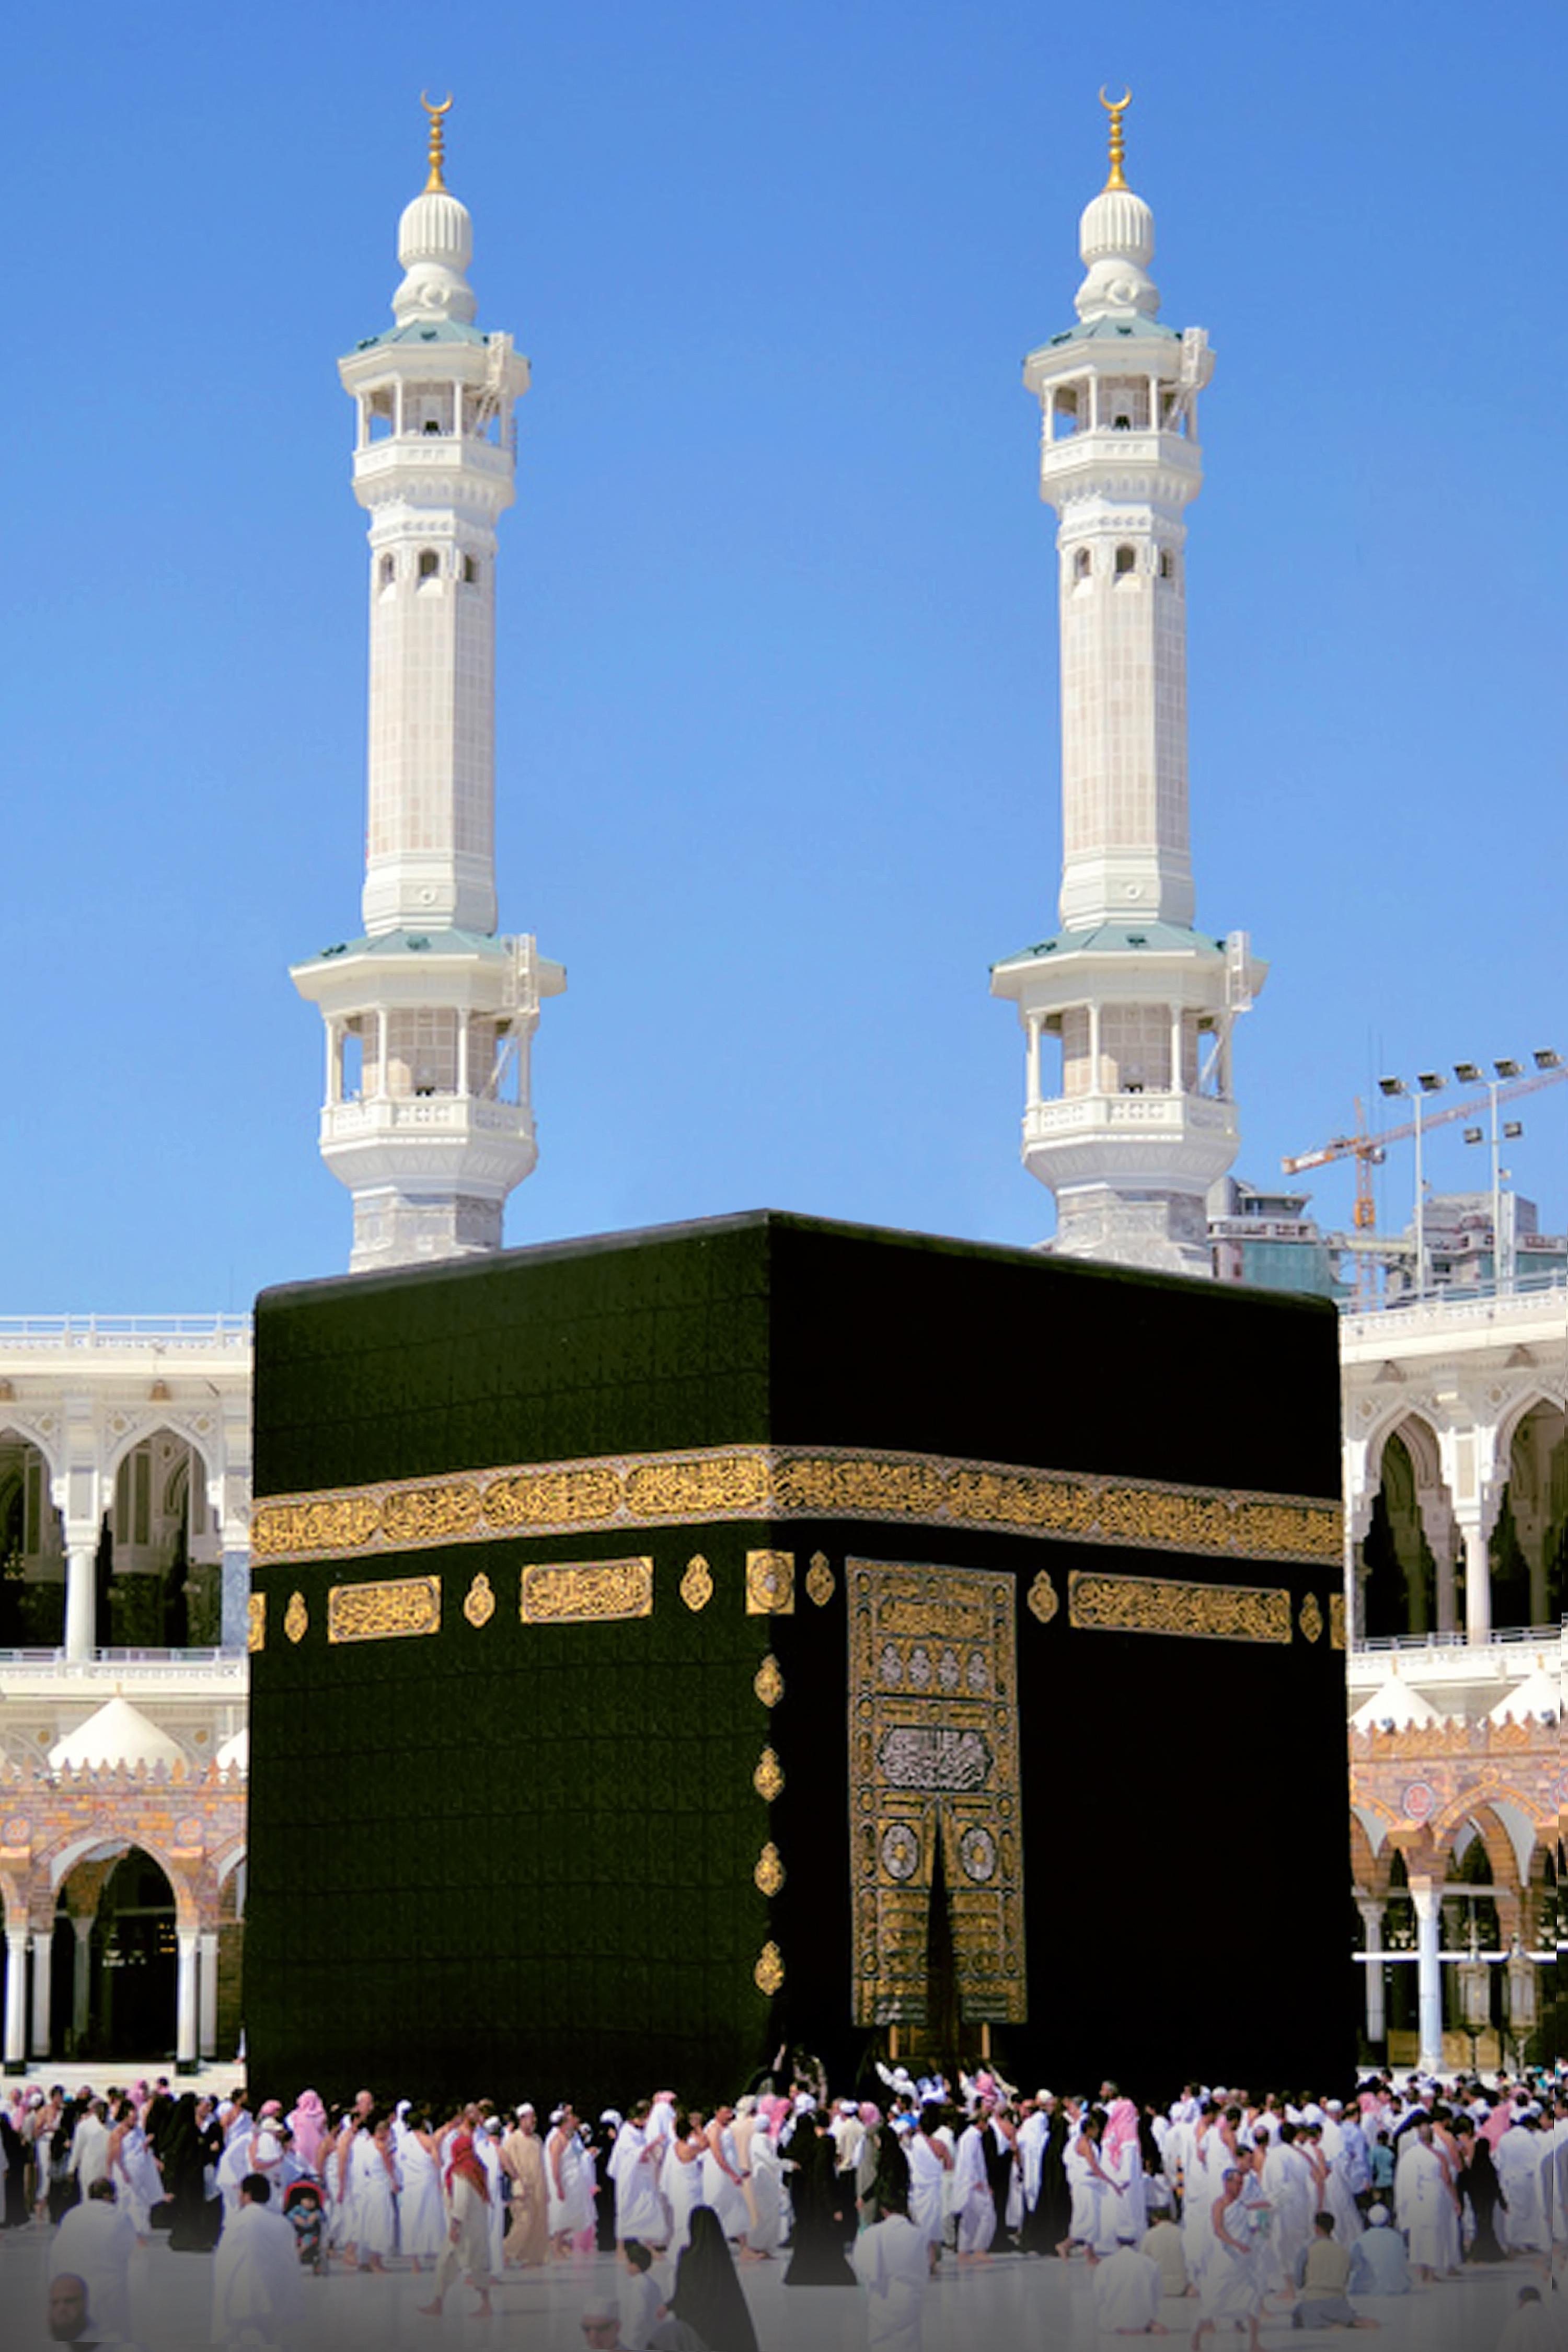 All Sizes Kaba Shareef Makkahbaitullah Shareef Allah